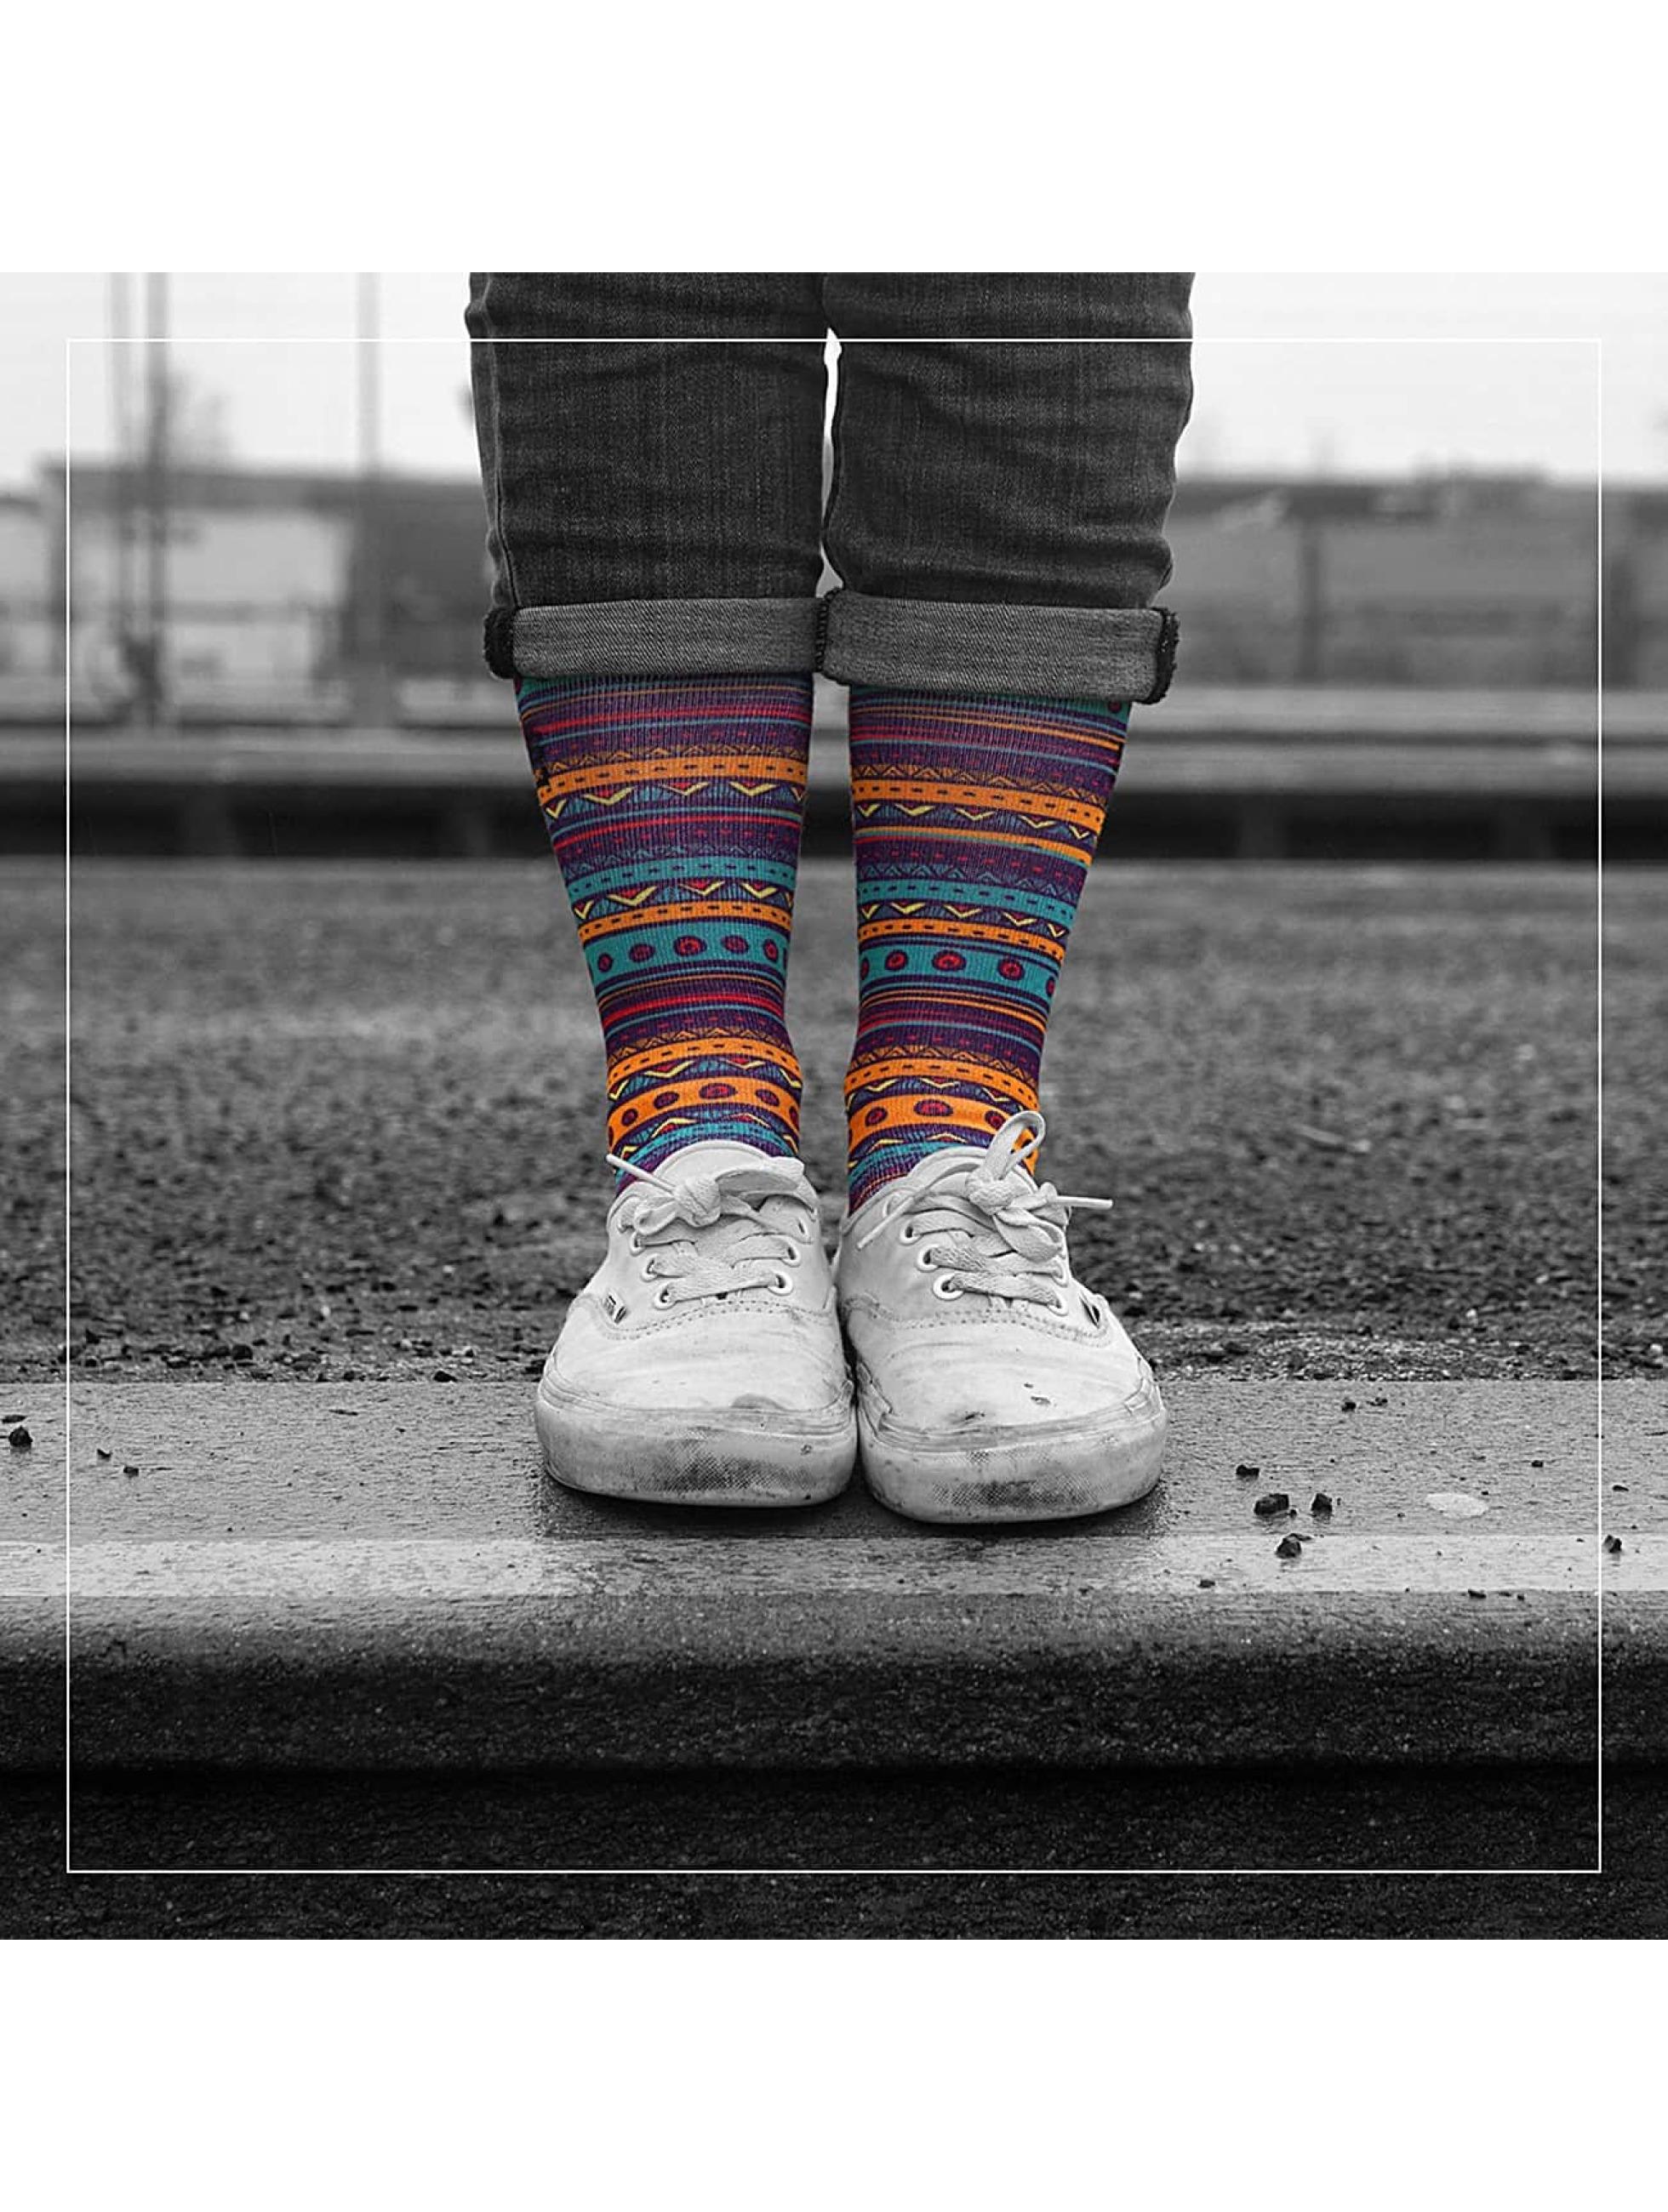 LUF SOX Socks La Paz colored